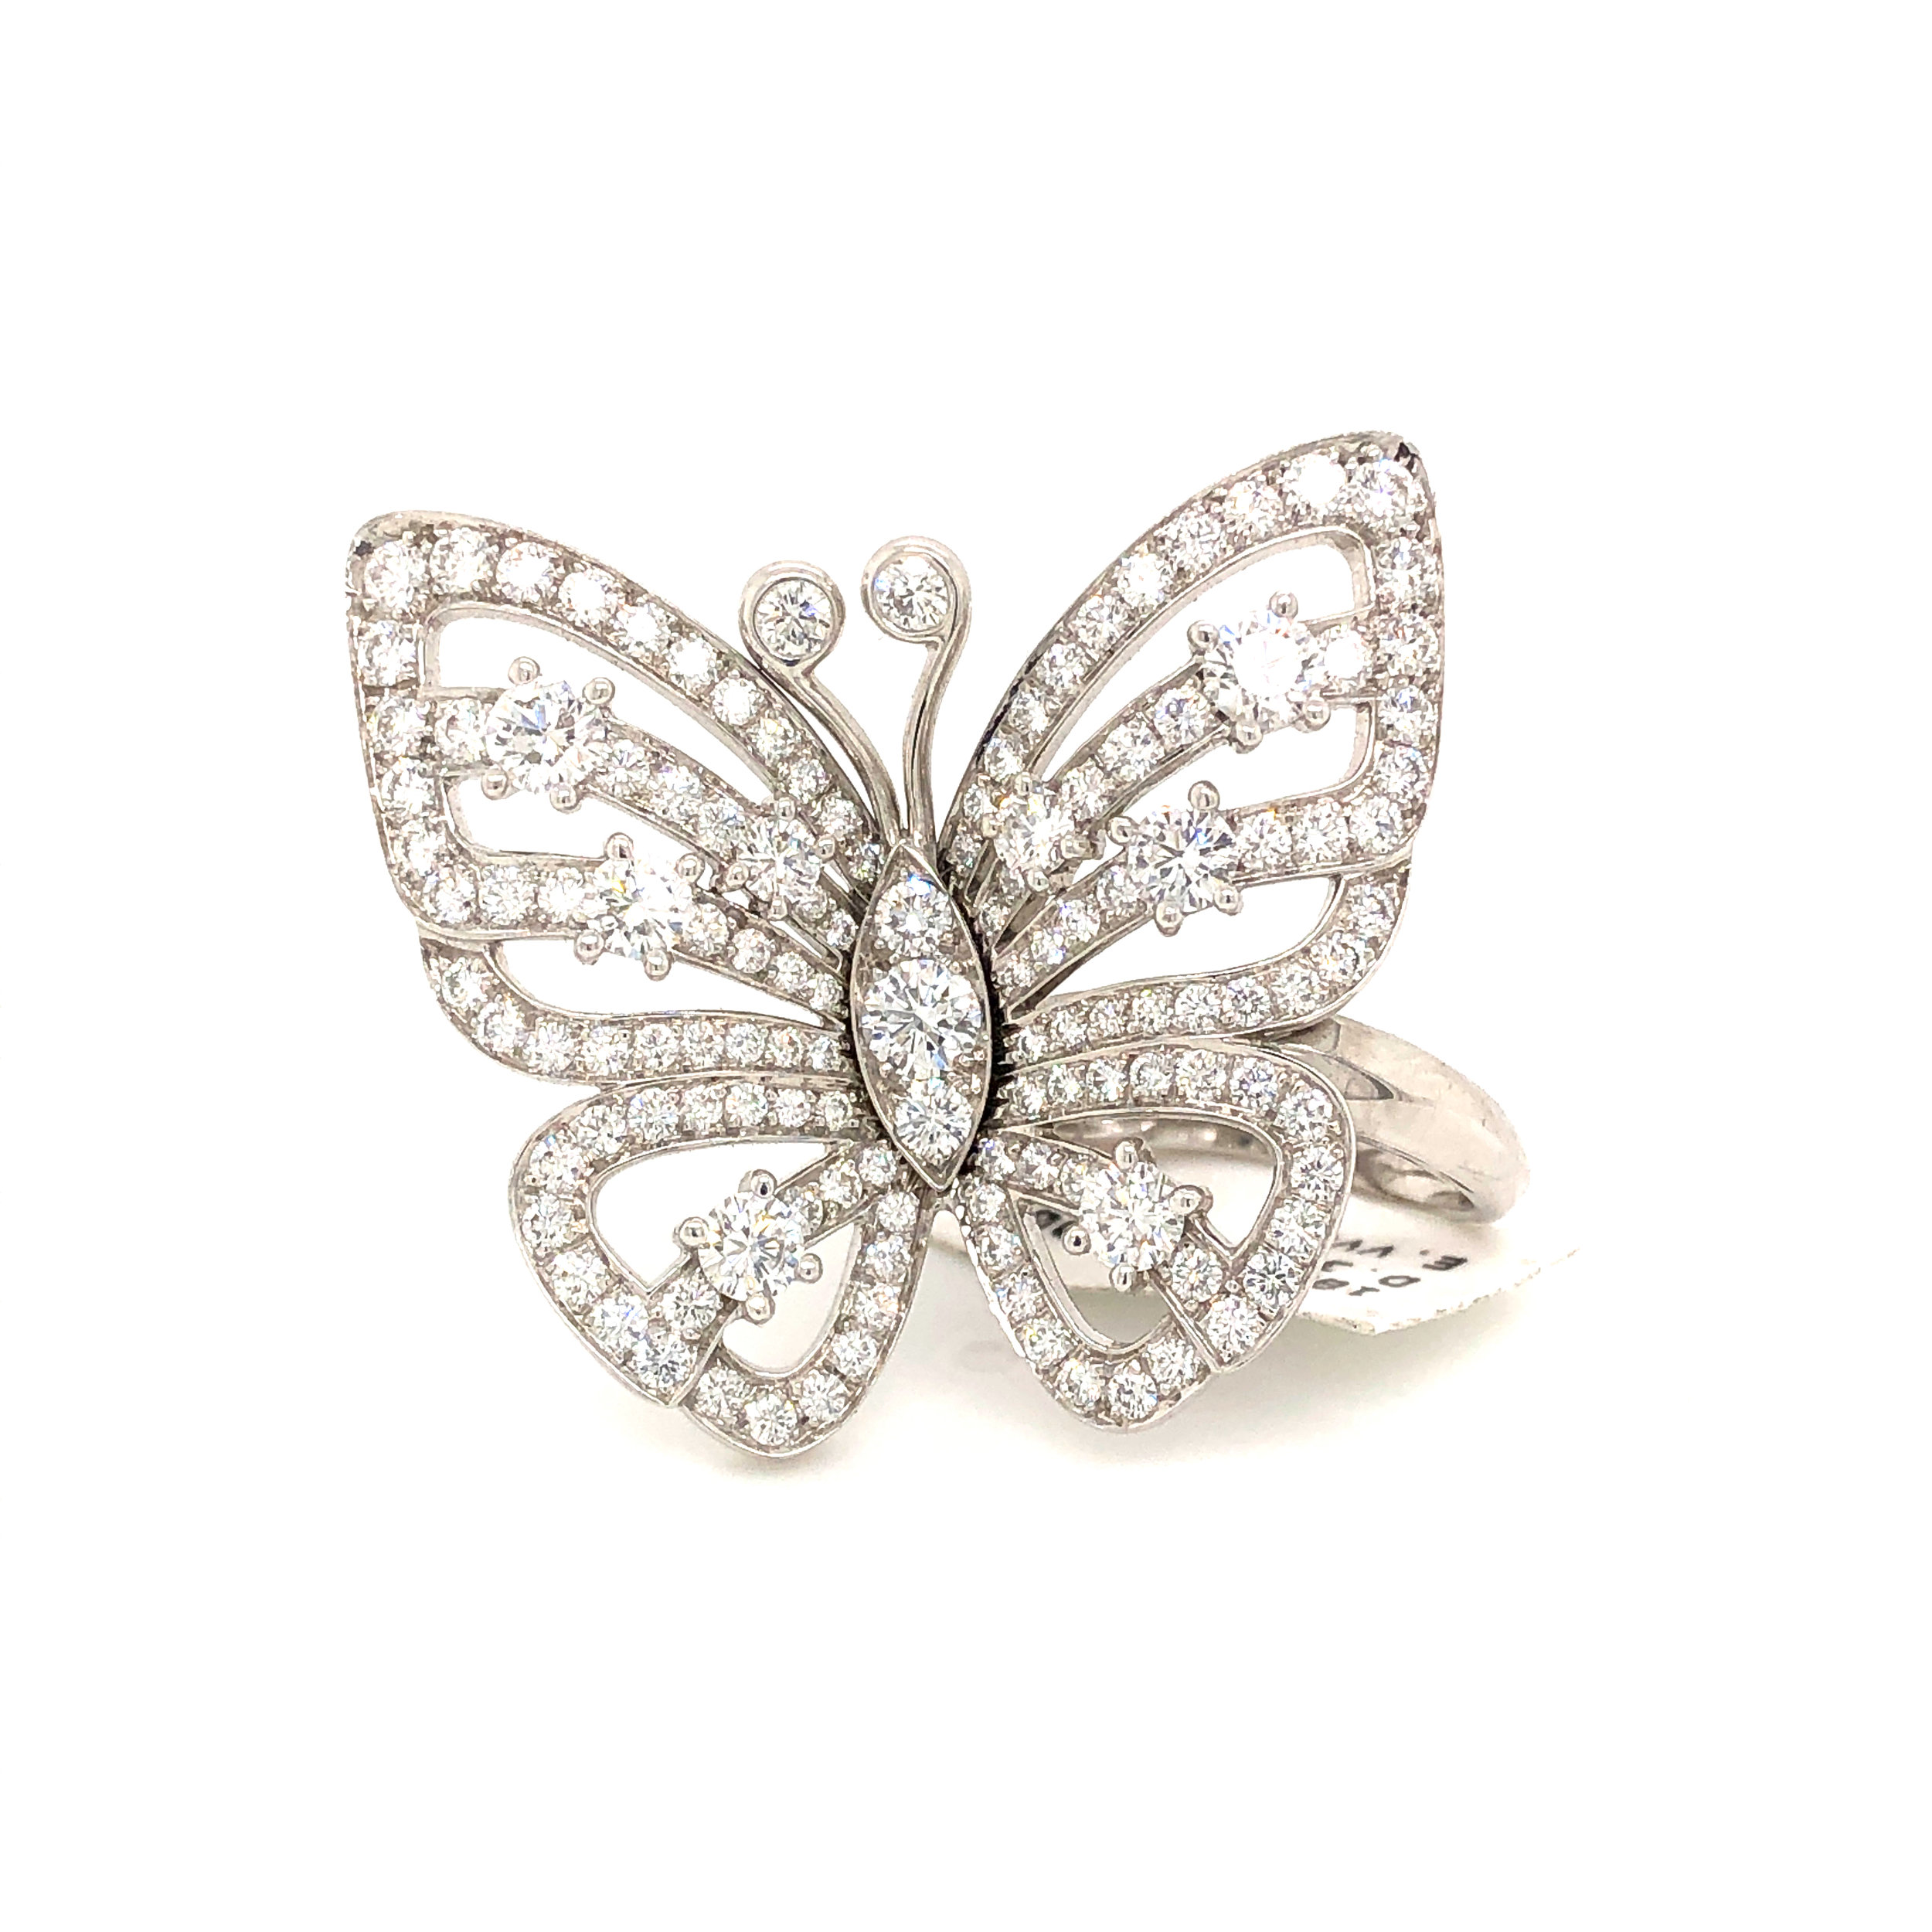 Butterfly Ring, 18kt White Gold & Diamond,  Van Cleef & Arpels   Est. US$ 27,000-31,000